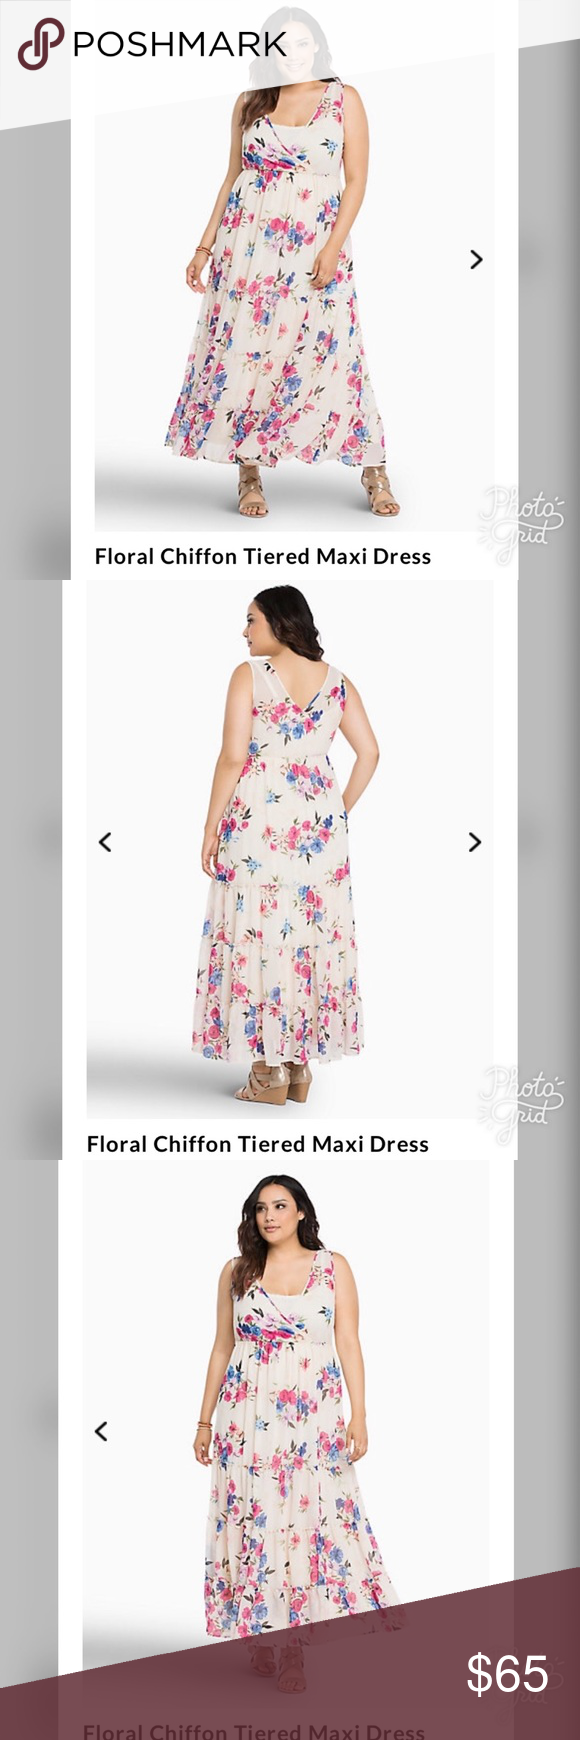 806bbd6da8 Torrid Floral Chiffon Tiered Floral Maxi Dress 00 Torrid Floral Chiffon  Tiered Floral Maxi Dress 00 Size 10 NEW torrid Dresses Maxi